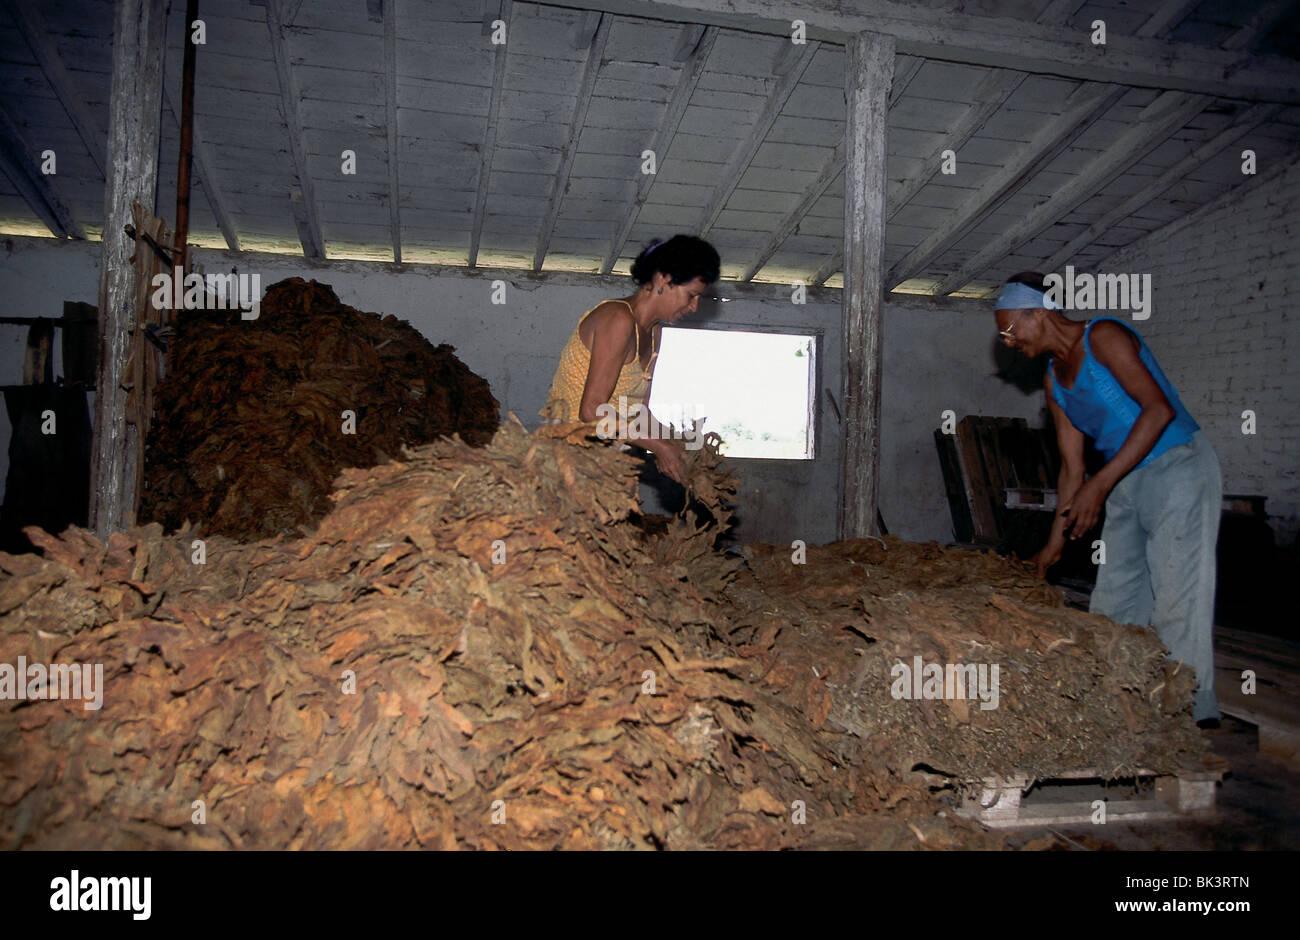 Farm workers processing tobacco in a warehouse, Pinar del RÌo Province near Soroa, Cuba - Stock Image